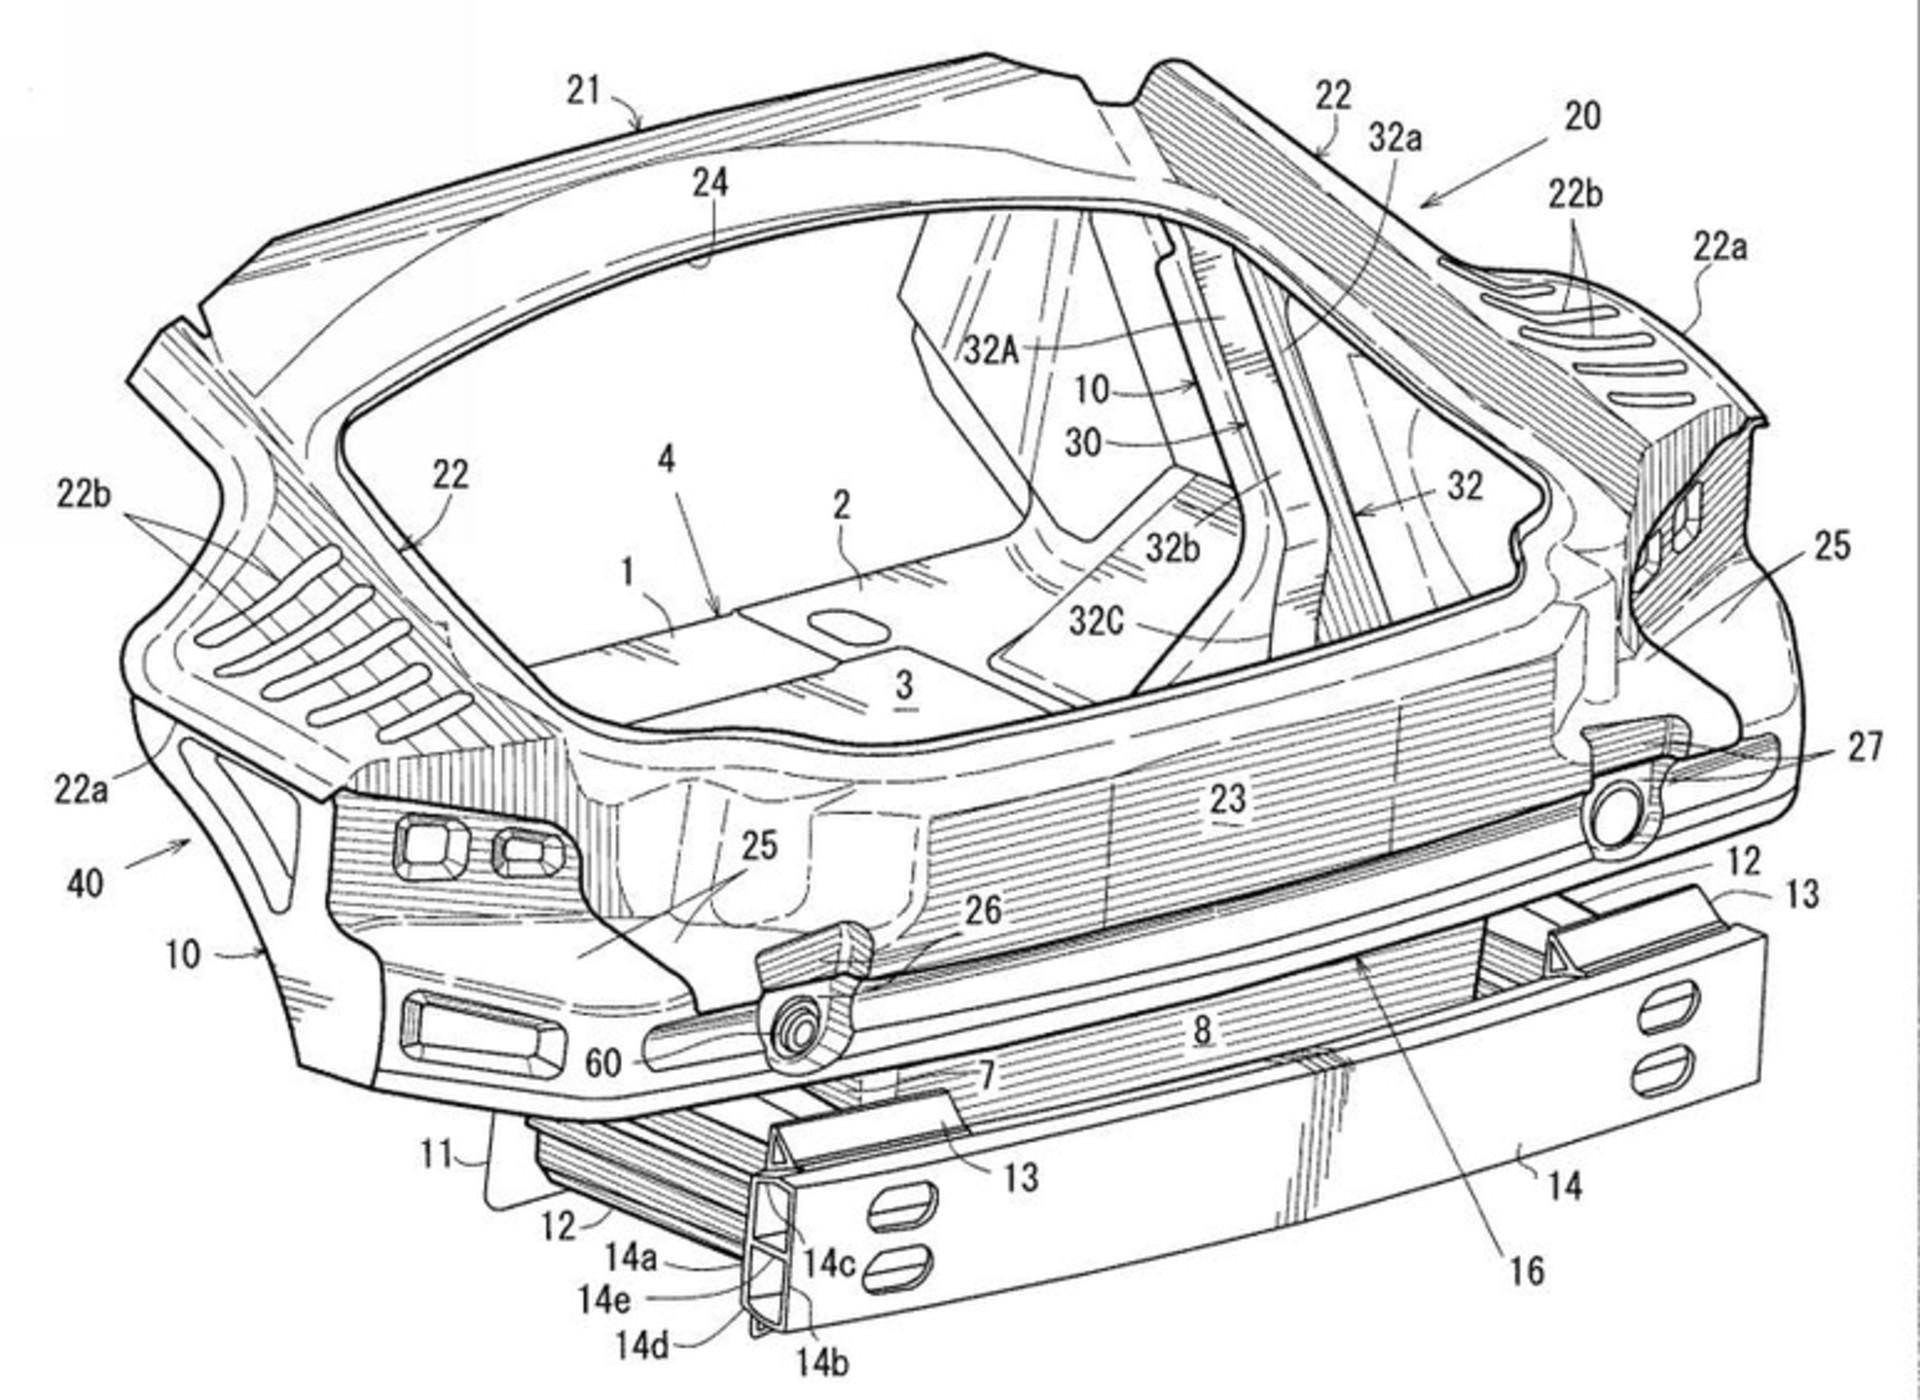 Mazda-Structure-patent-filing-12